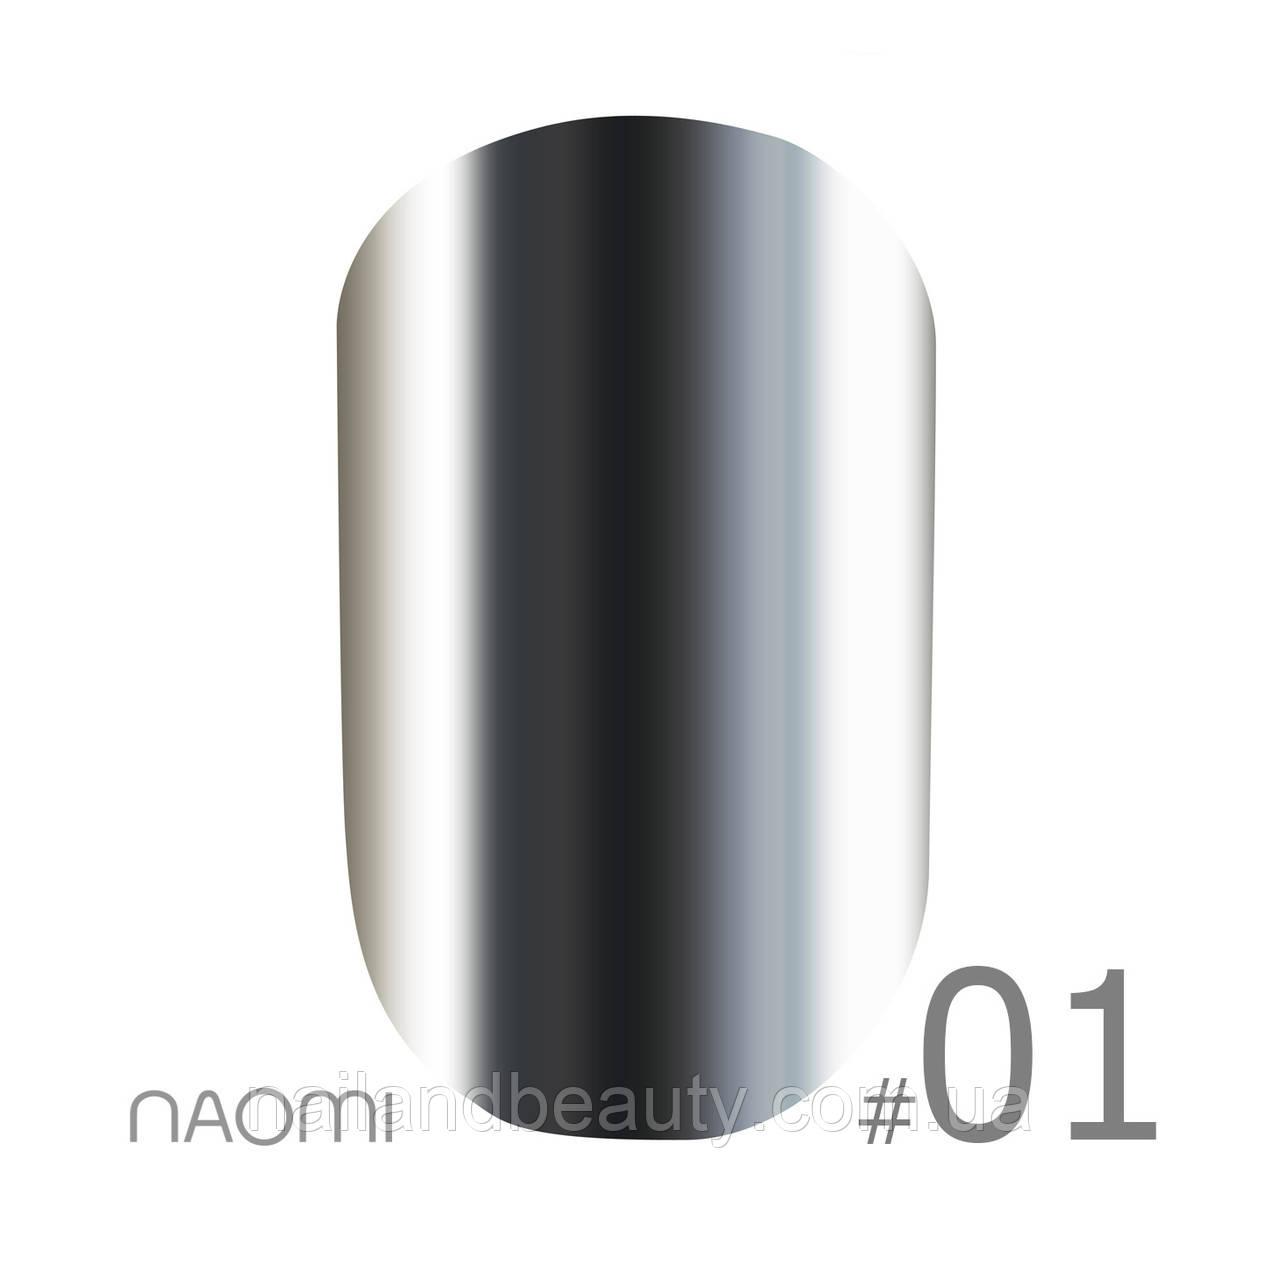 Naomi Зеркальная пудра для ногтей №01, 1г